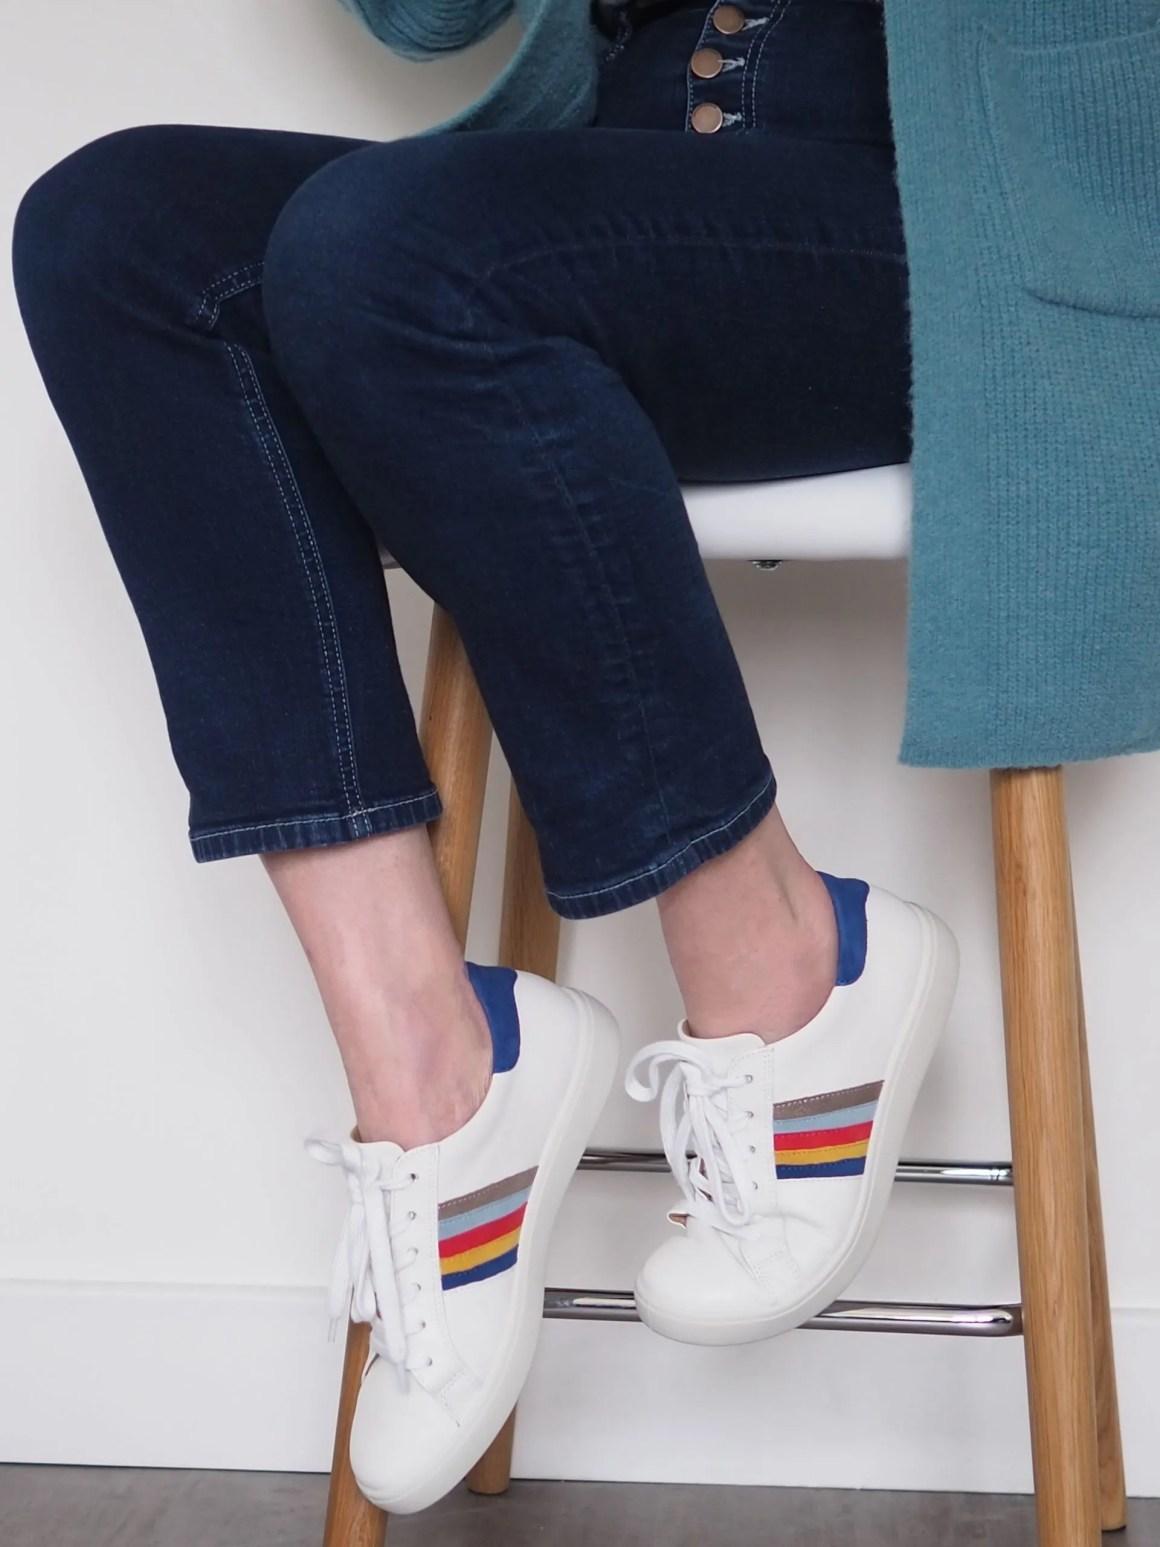 Elizabeth wears breton top, jeans and rainbow trainers